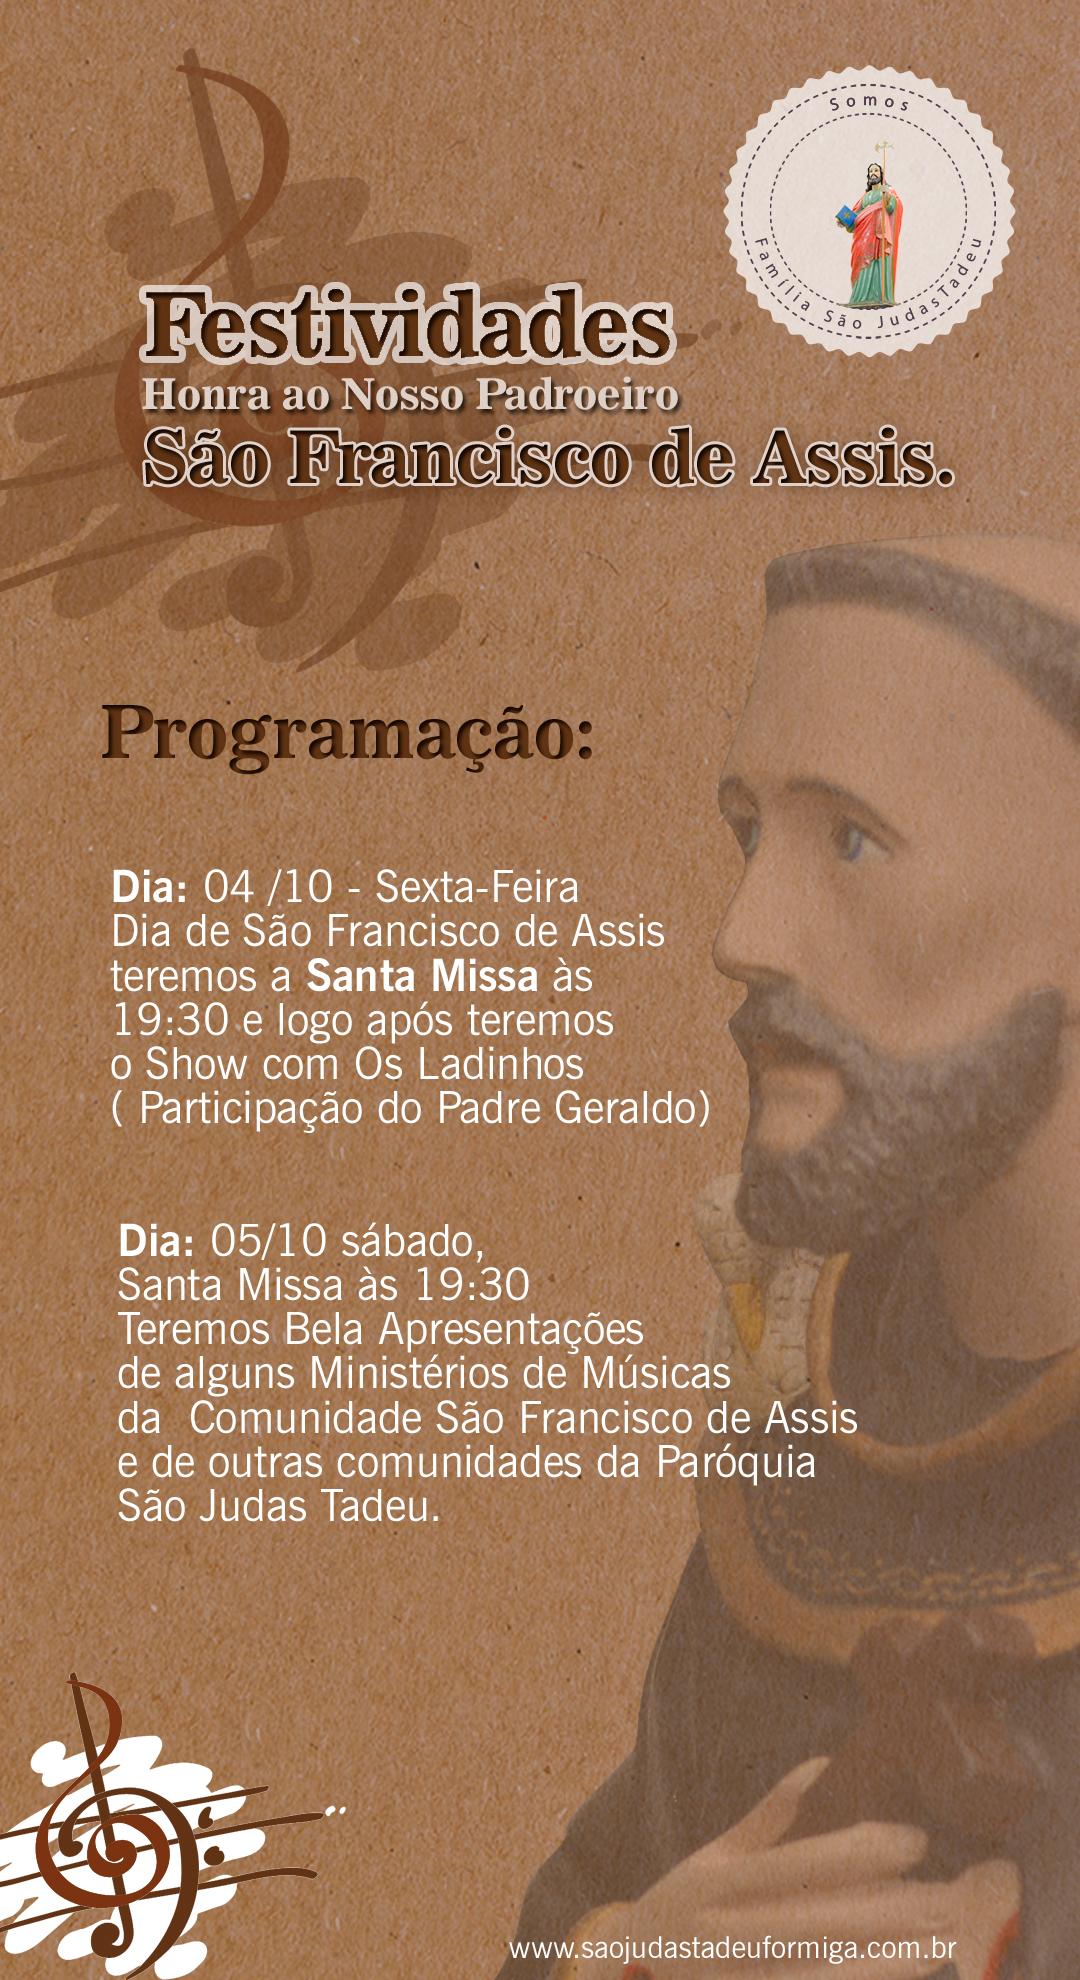 festividades-sao-francisco-2019a